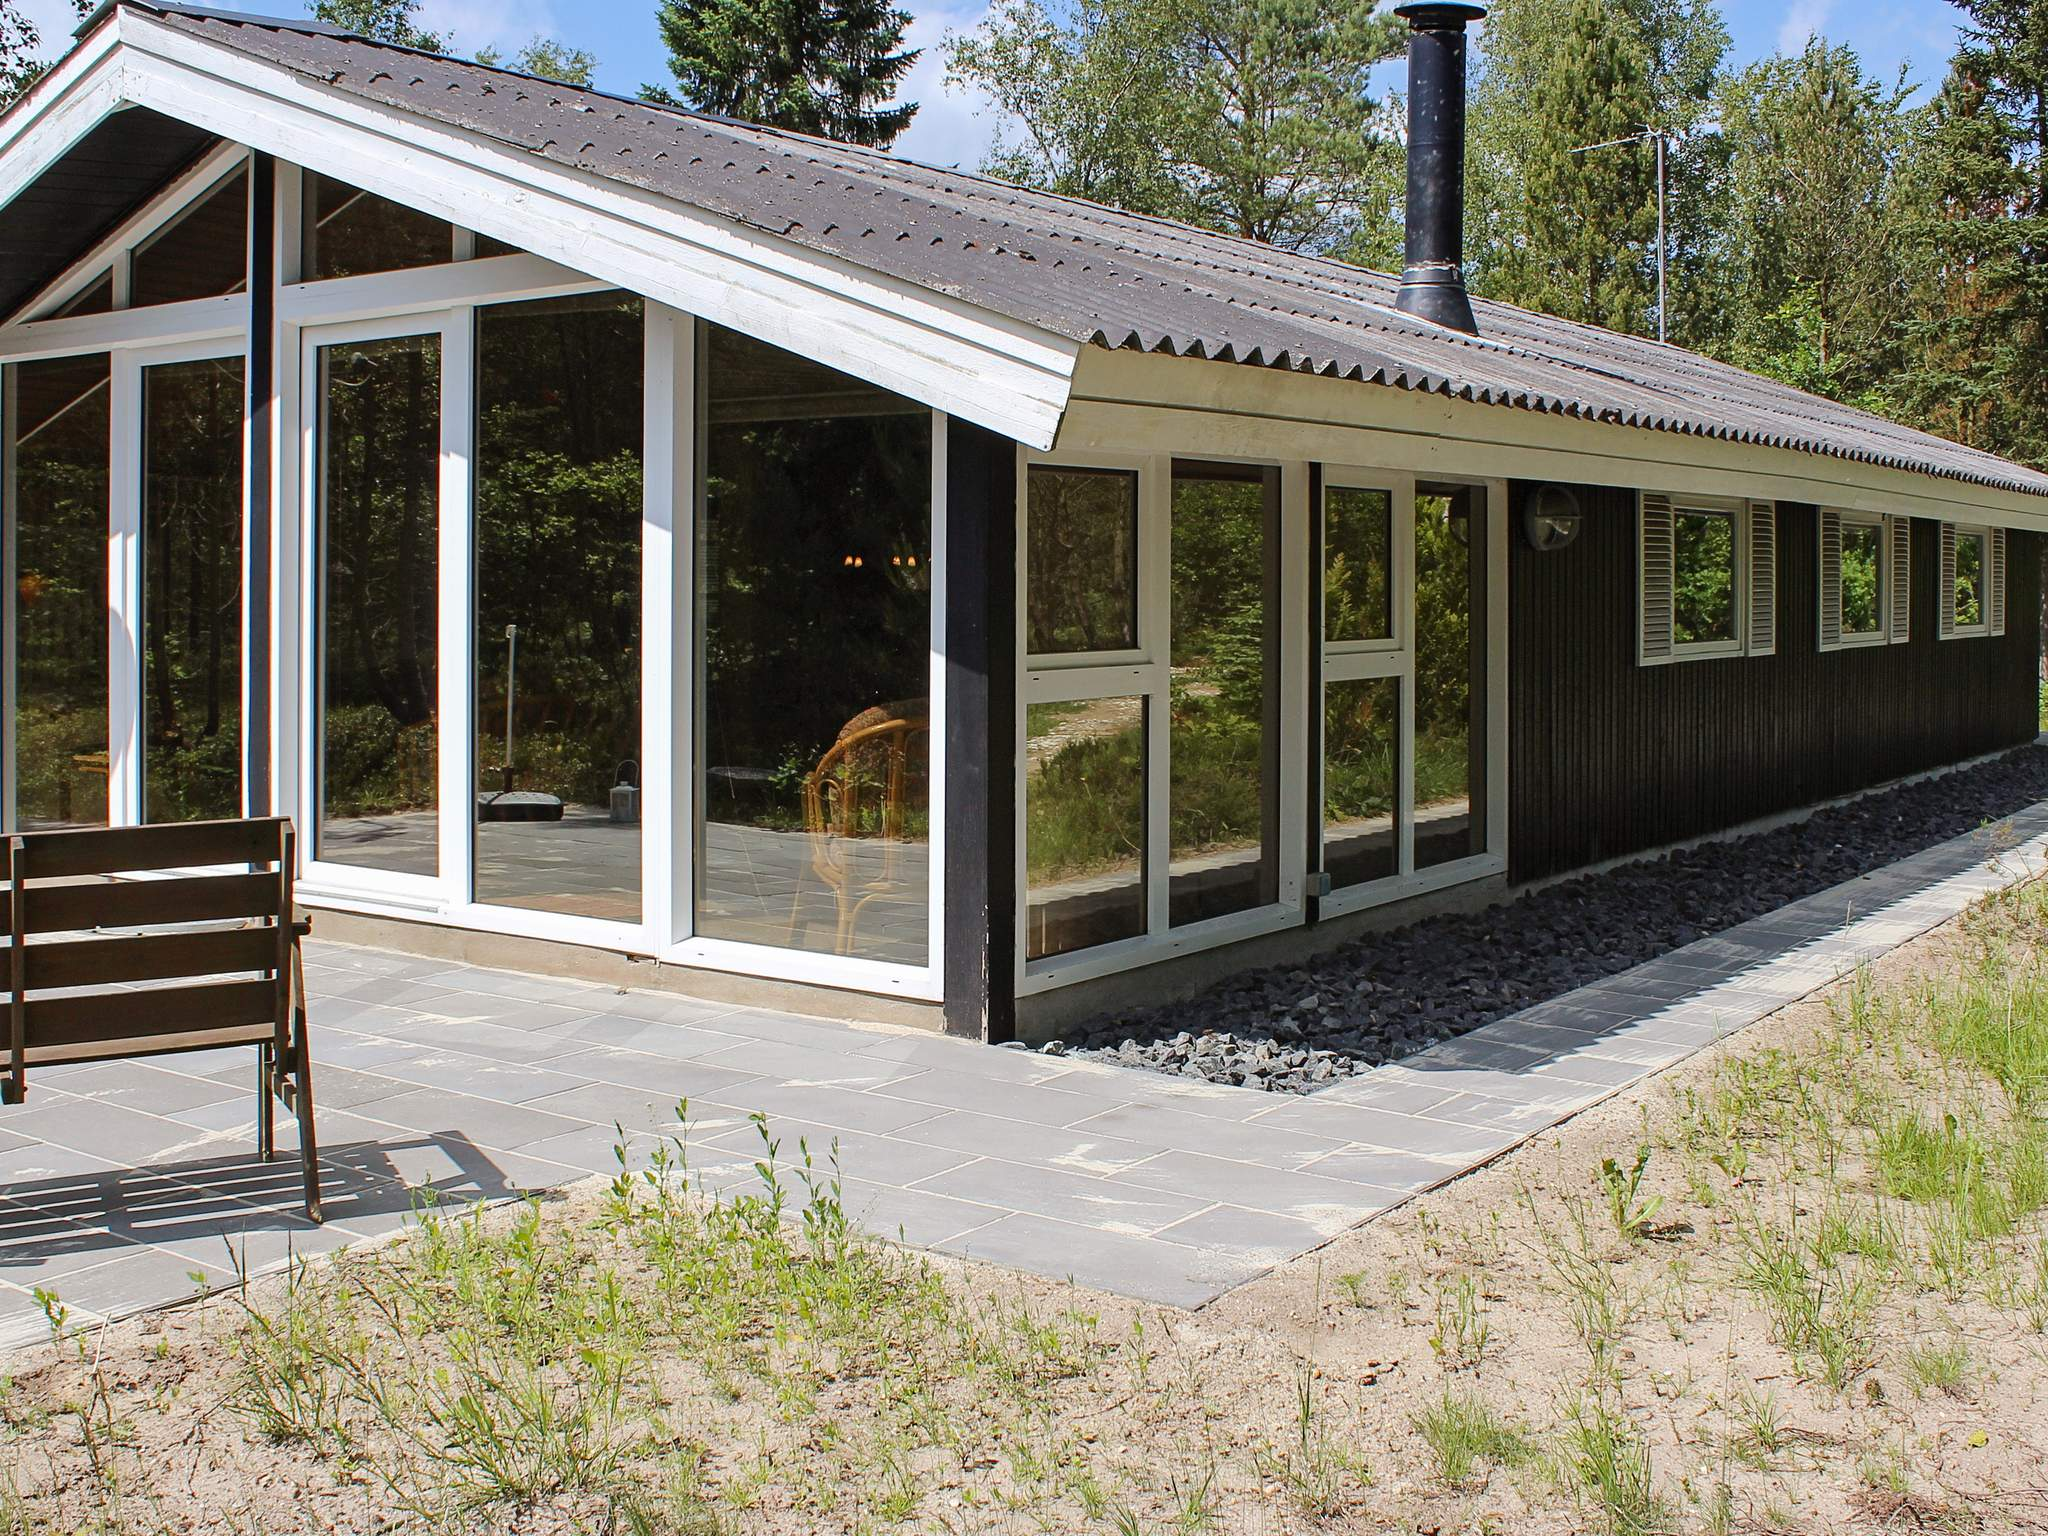 Ferienhaus Kølkær (377905), Kølkær, , Westjütland, Dänemark, Bild 17